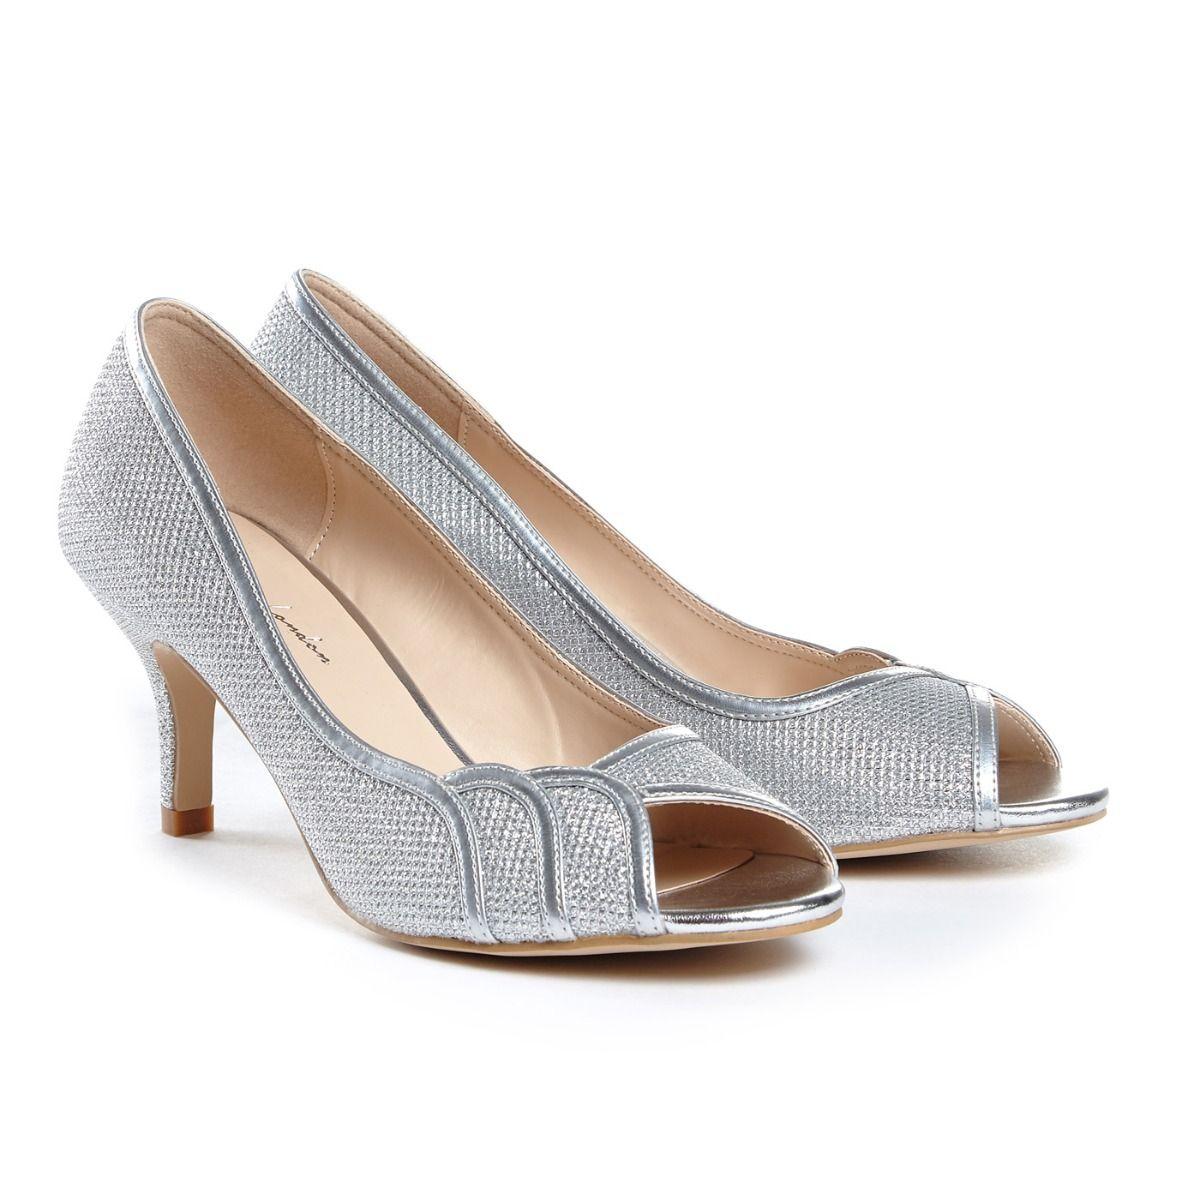 d8685f18b31 Pink Paradox Gracia Wide Fit - Silver Low Heel Peep Toe - Crystal ...